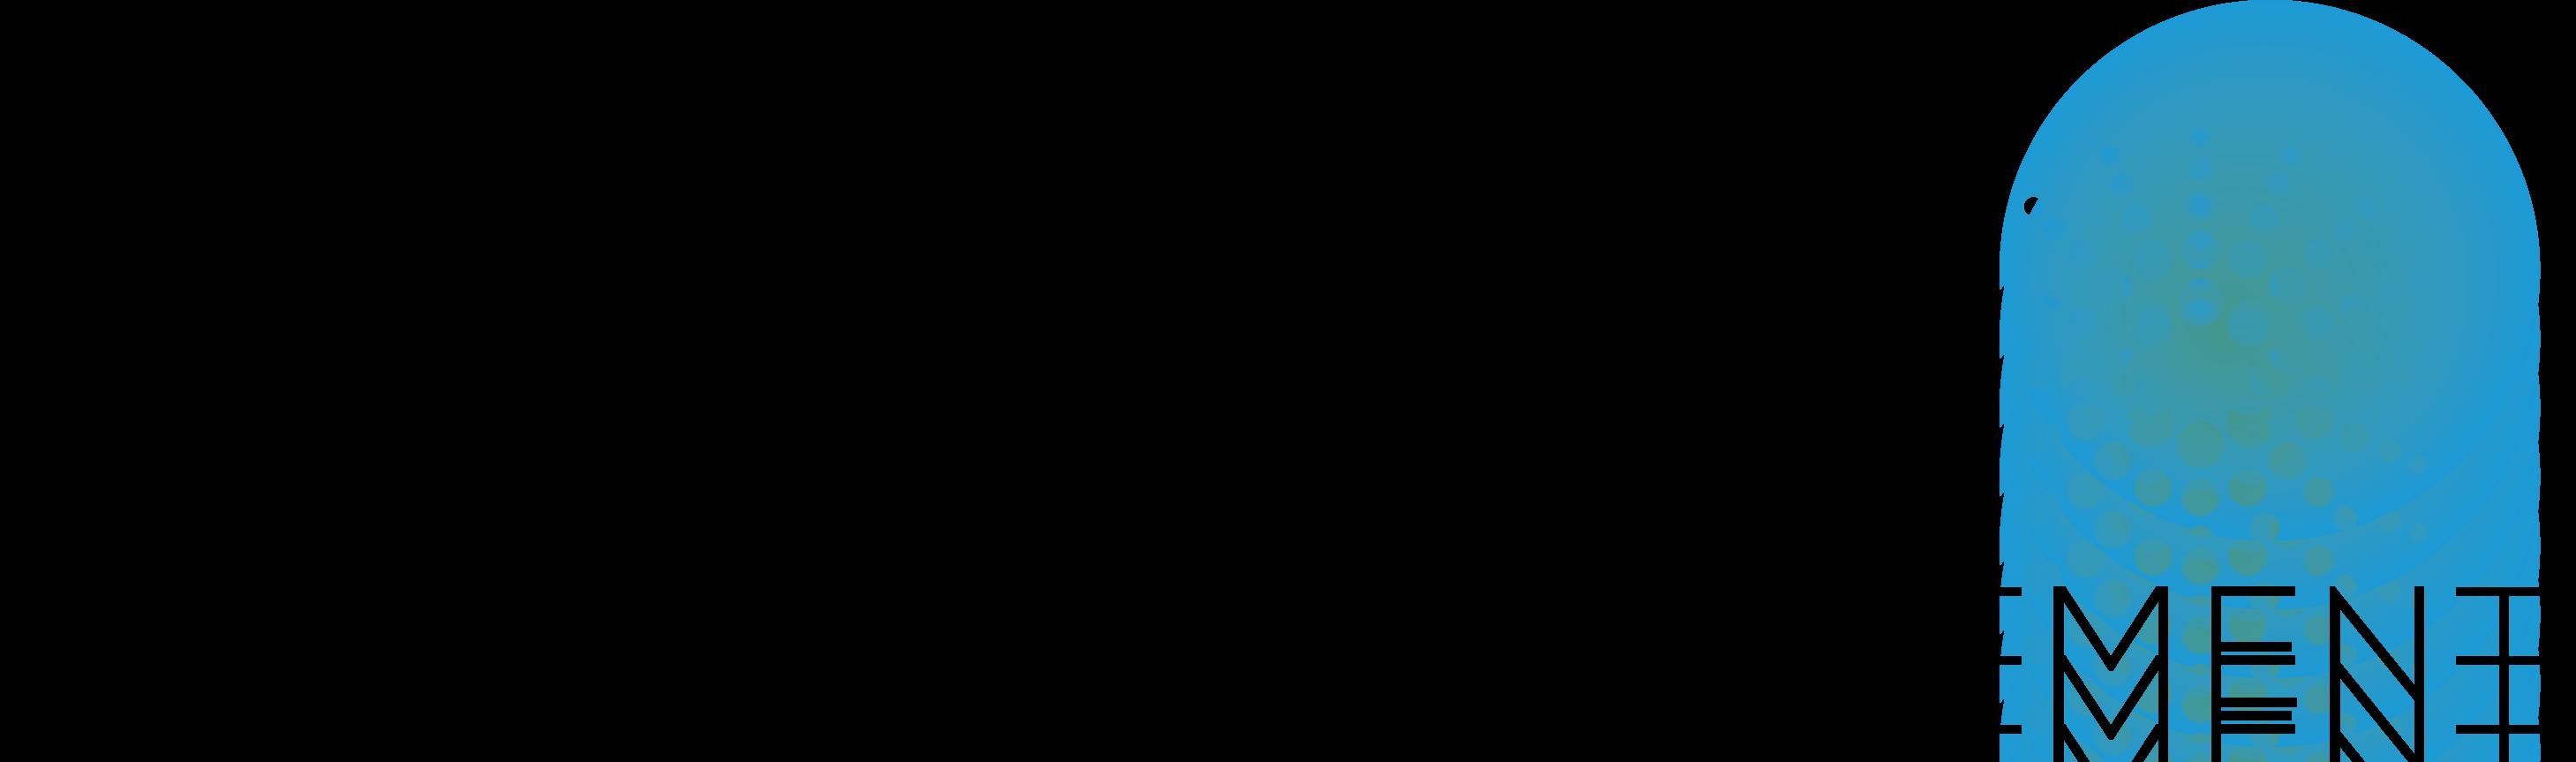 Connectx